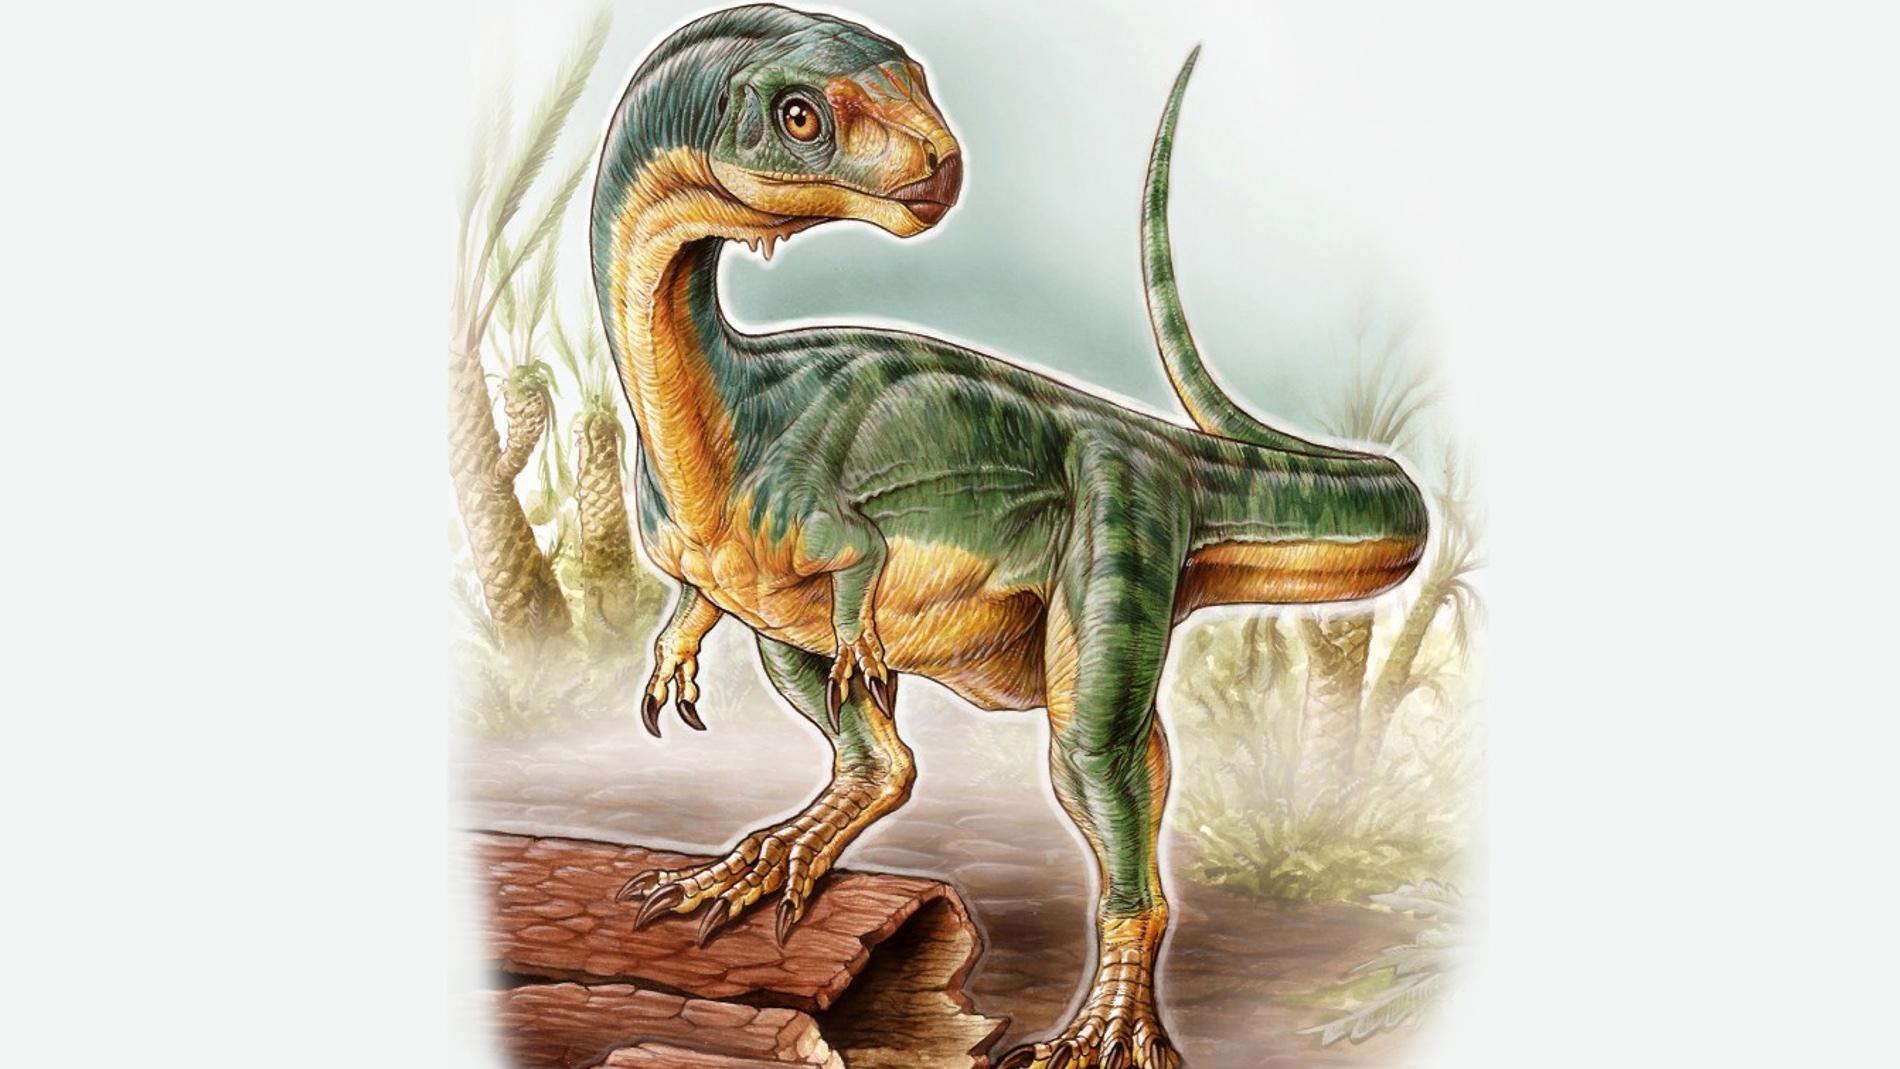 Nuevo terópodo, mitad puma, mitad T-Rex